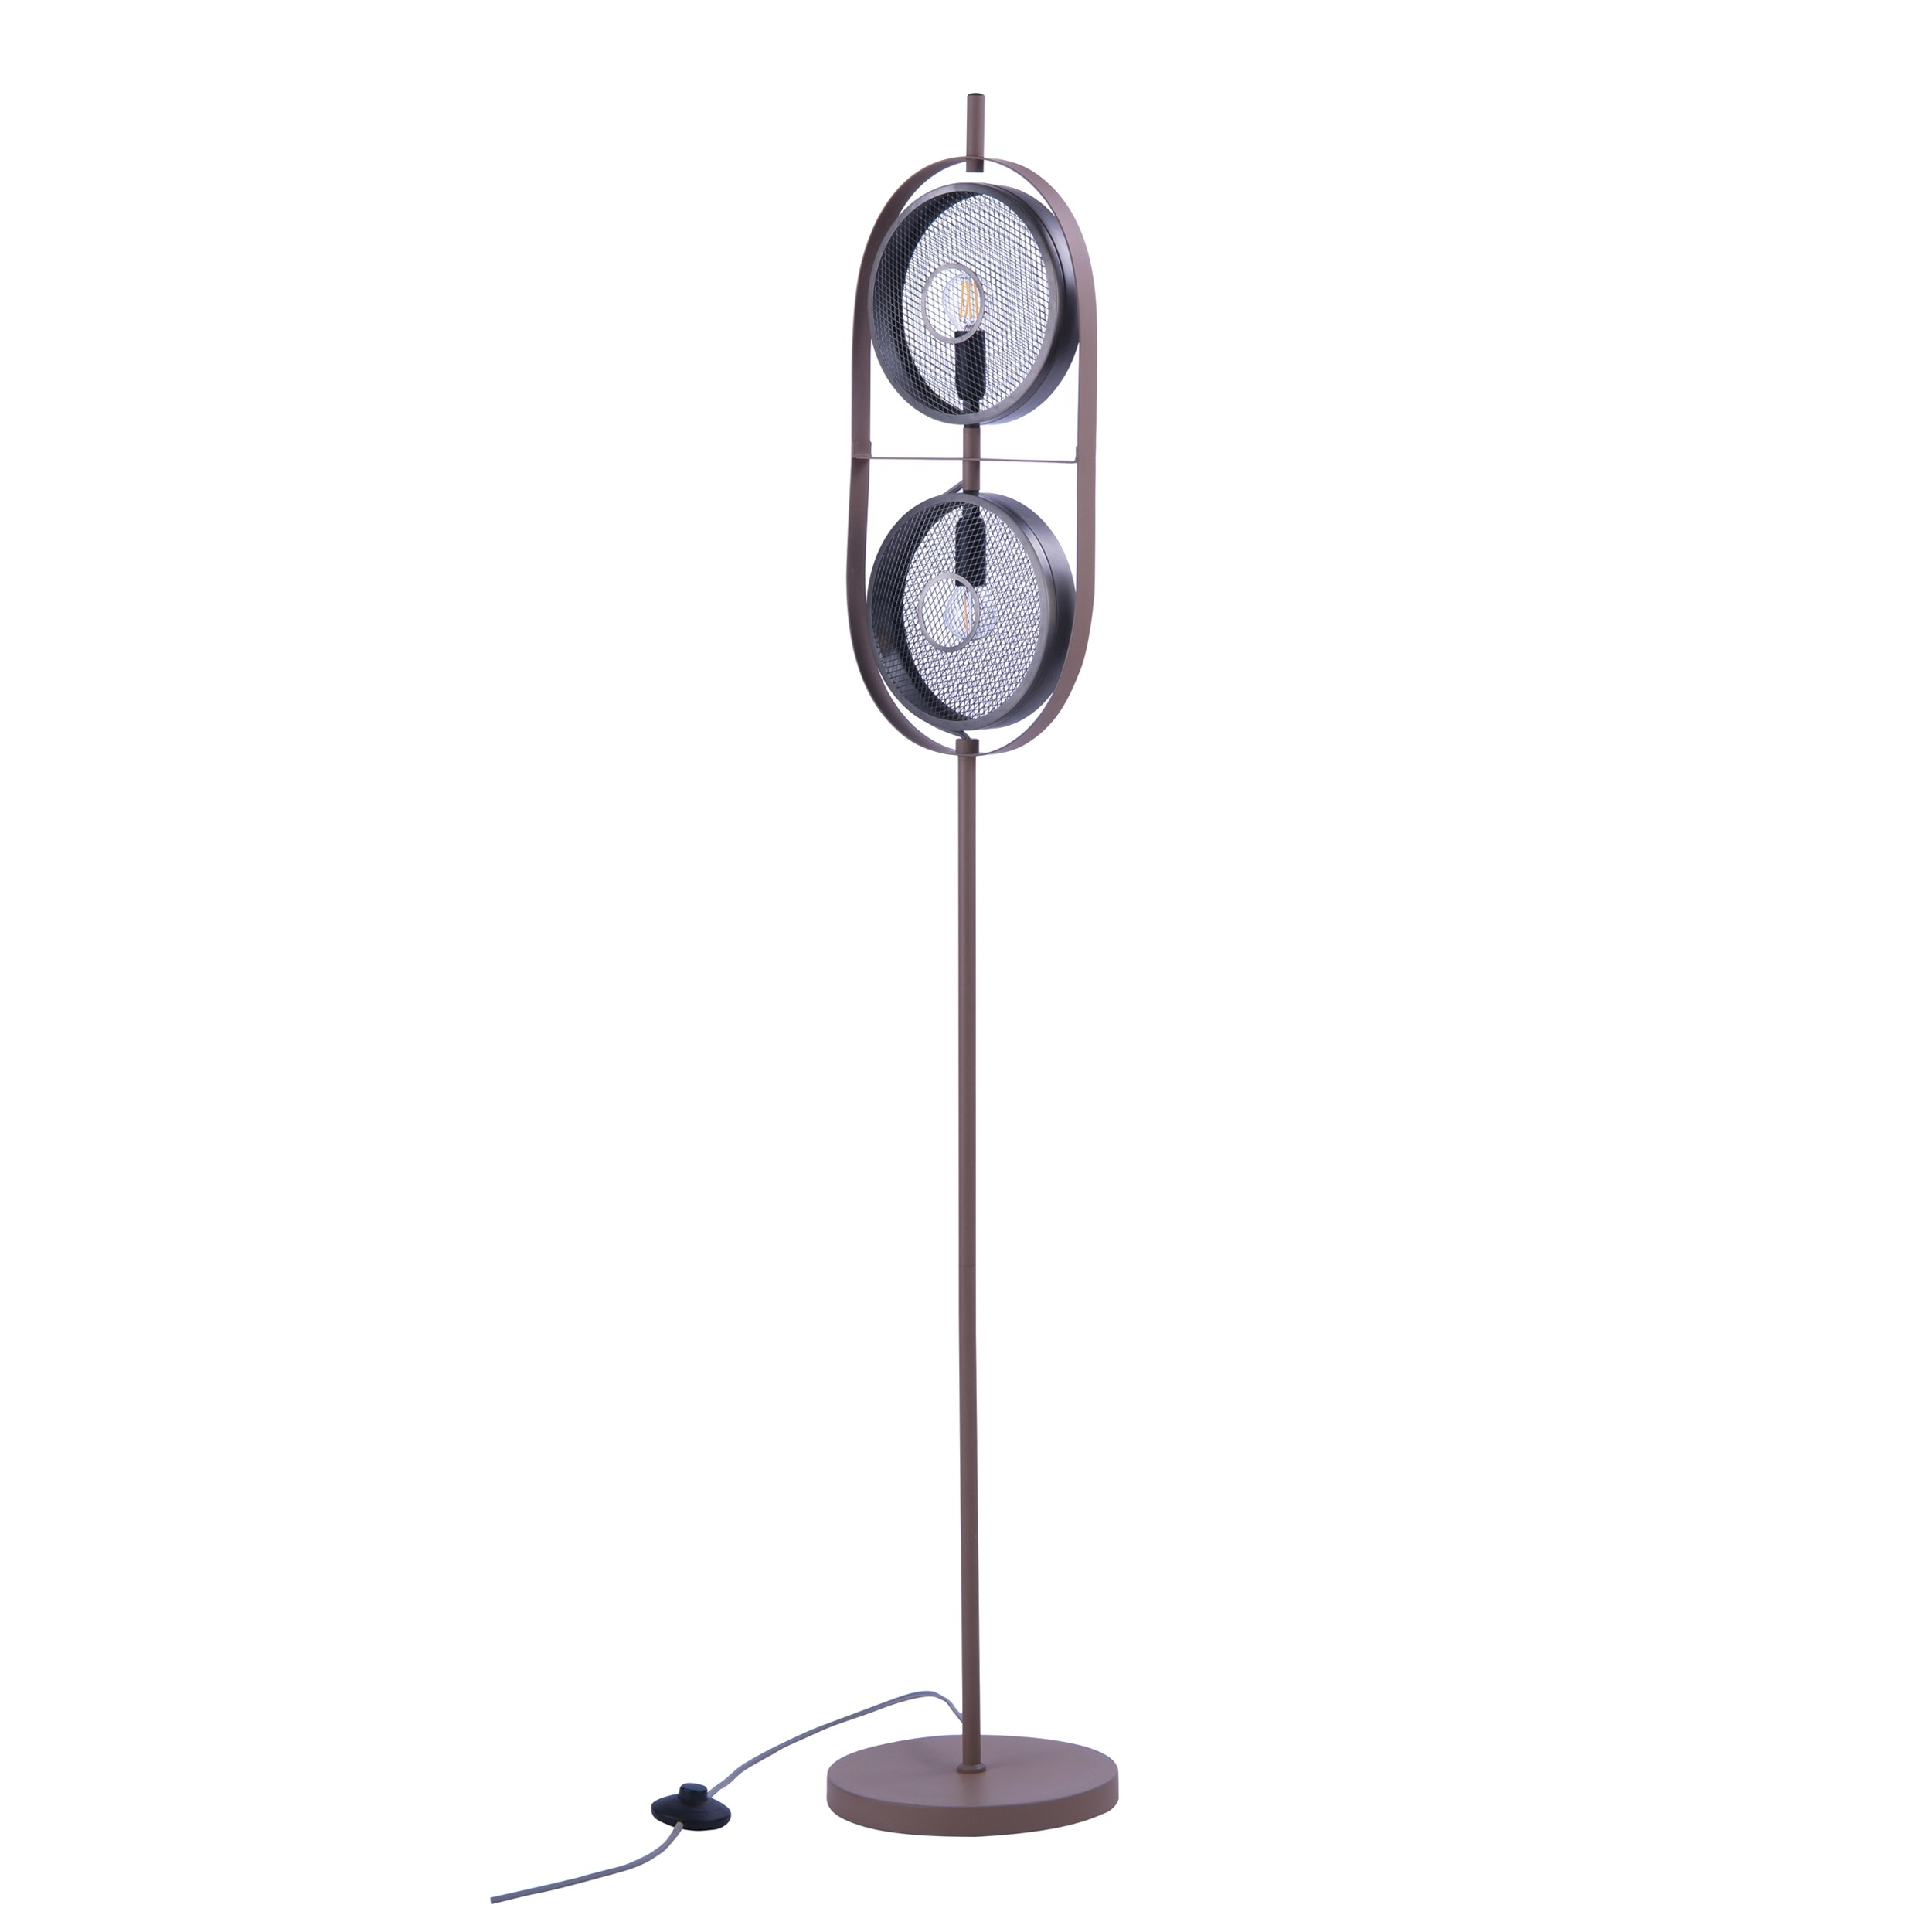 acheter lampadaire en metal grillage